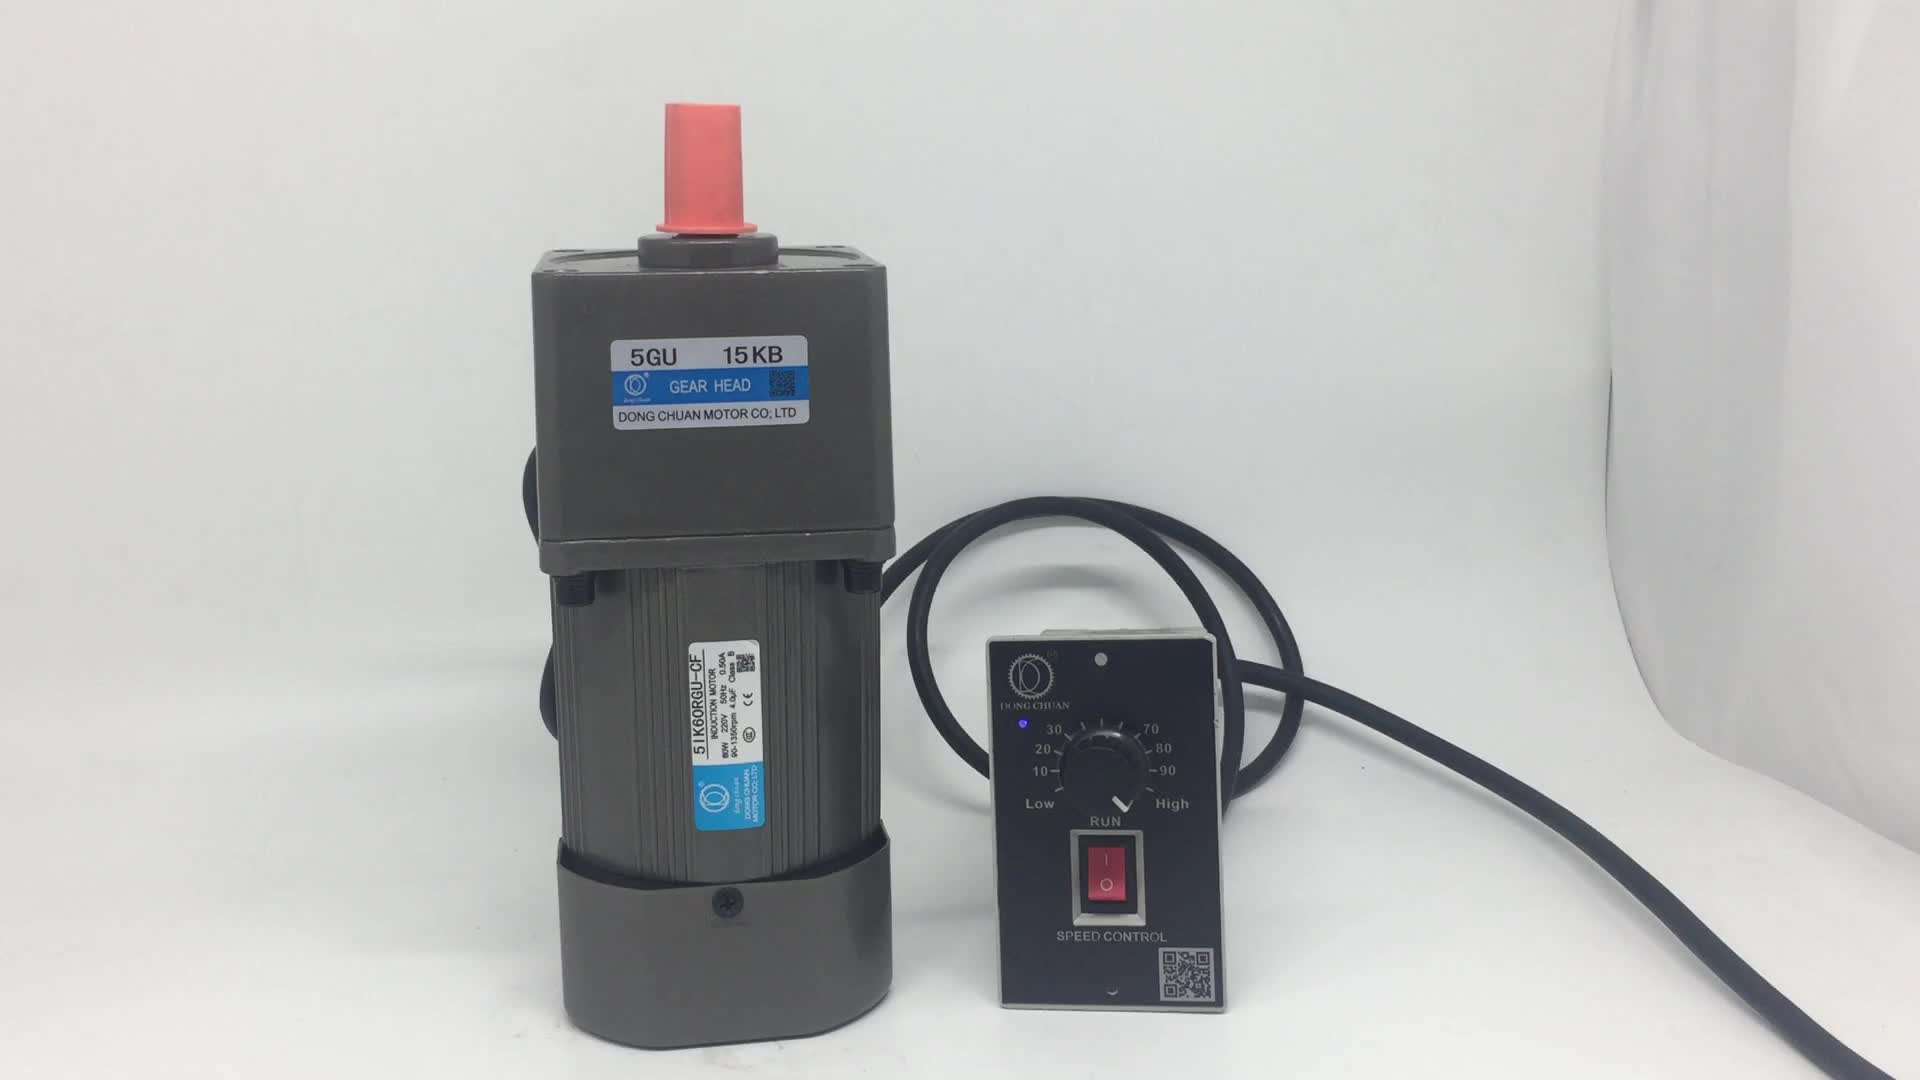 Dongchuanハイト品質60ワット90ワット120ワット単相非同期モータ小さな可変速度電動モーター